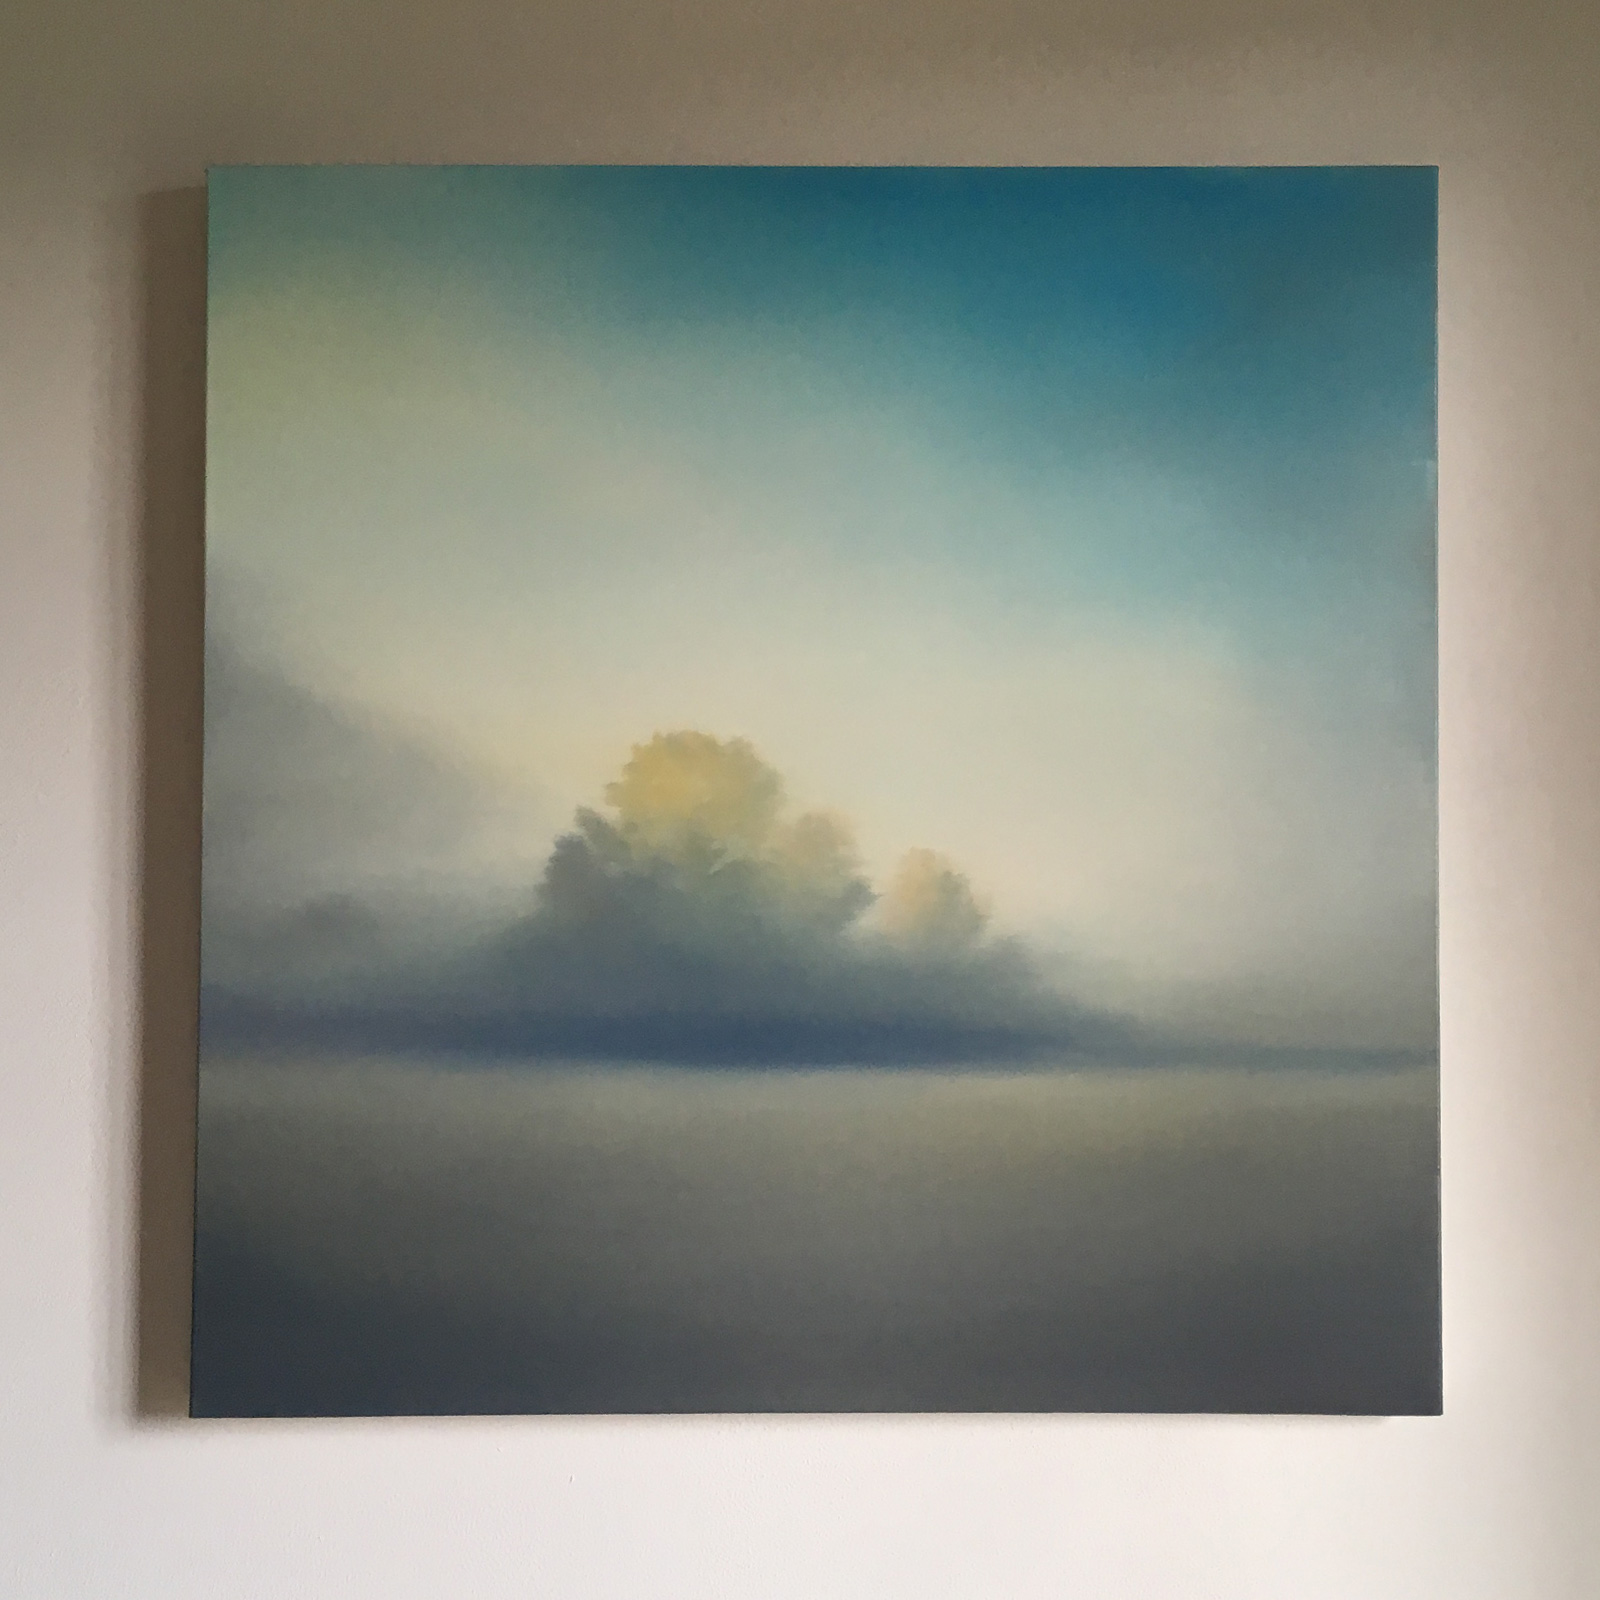 T#108-2018, oil on canvas, 60x60cm, priv. coll.